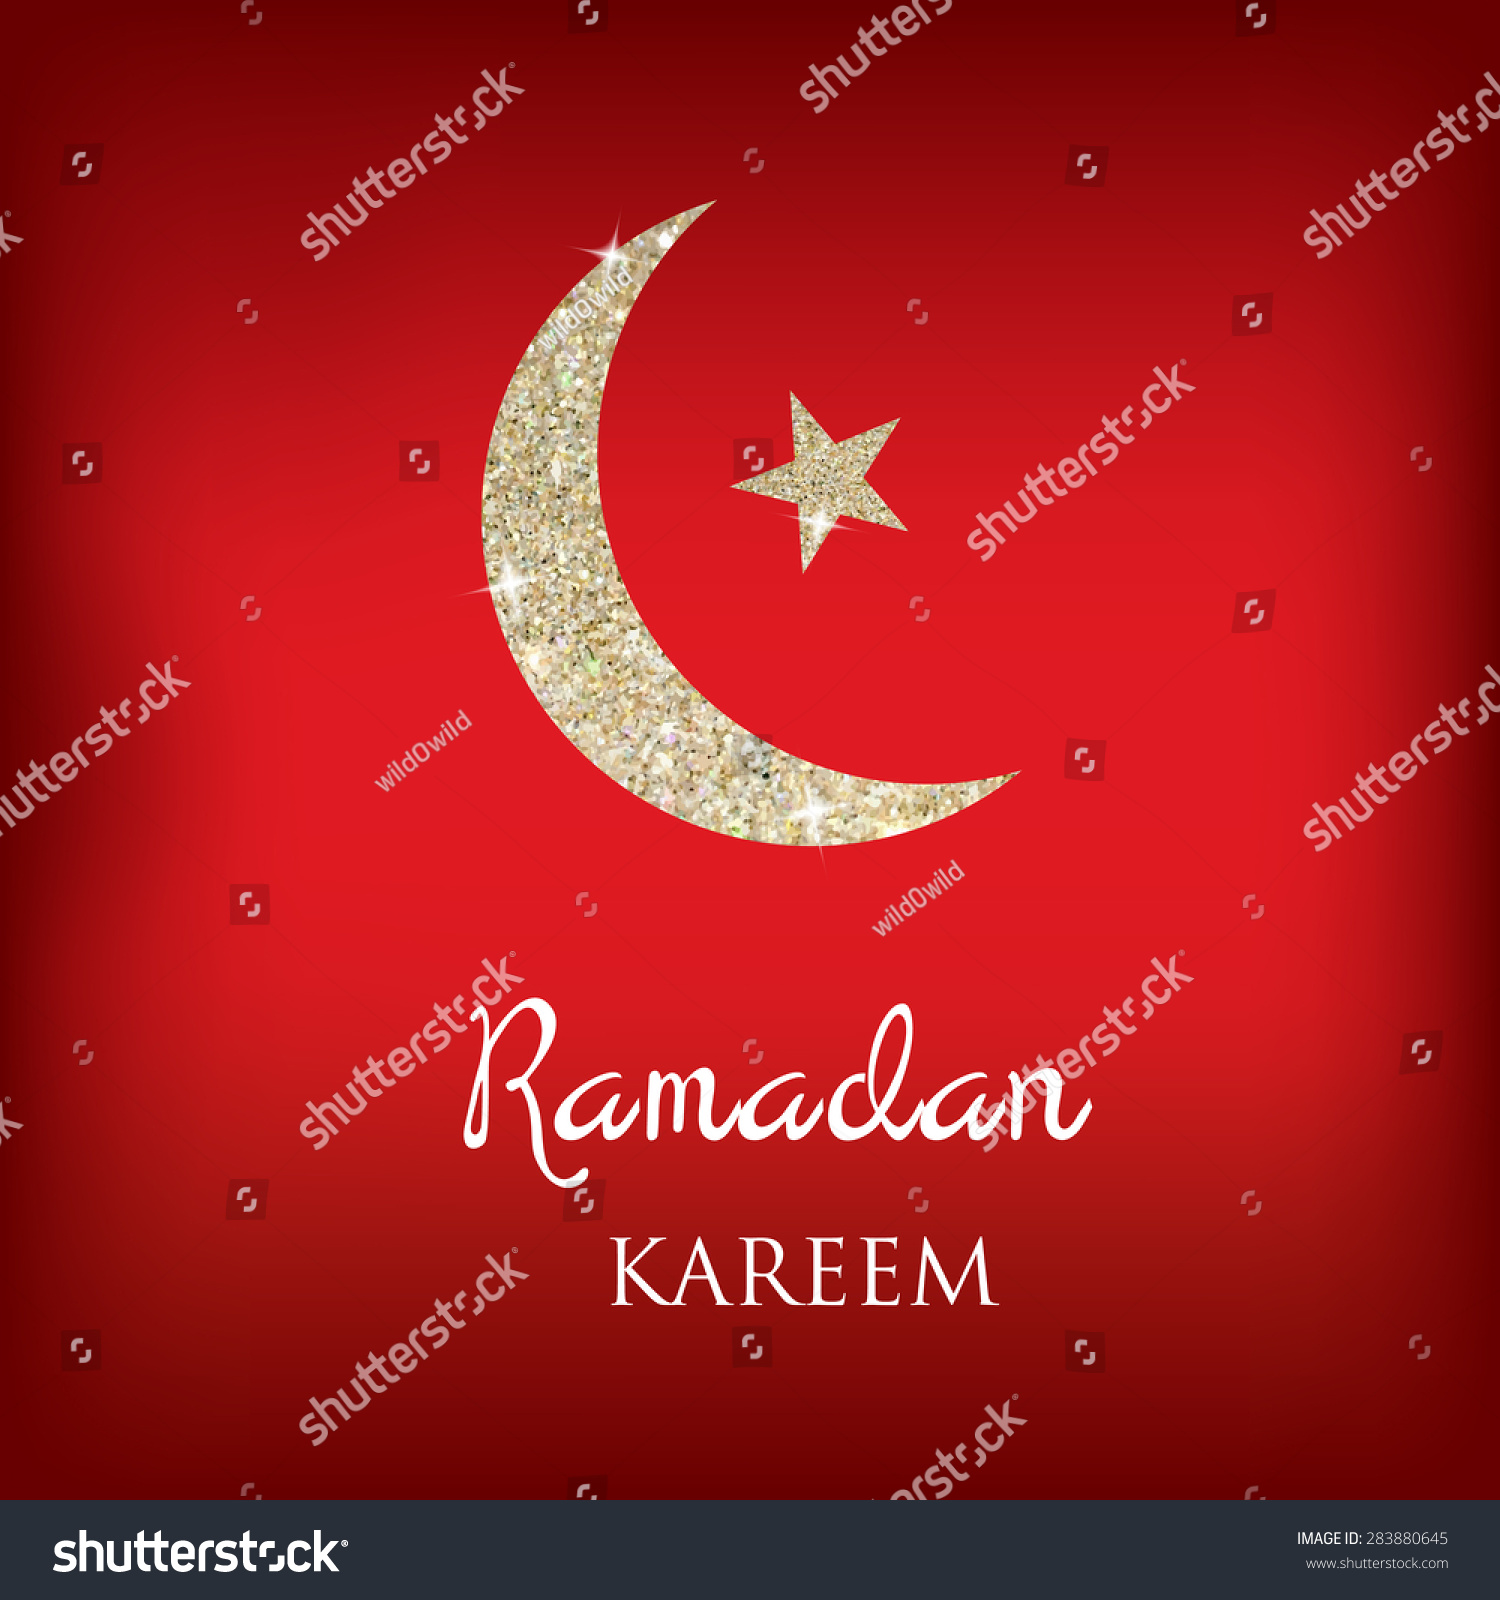 Ramadan greetings background ramadan kareem means stock vector ramadan greetings background ramadan kareem means ramadan the generous month kristyandbryce Choice Image